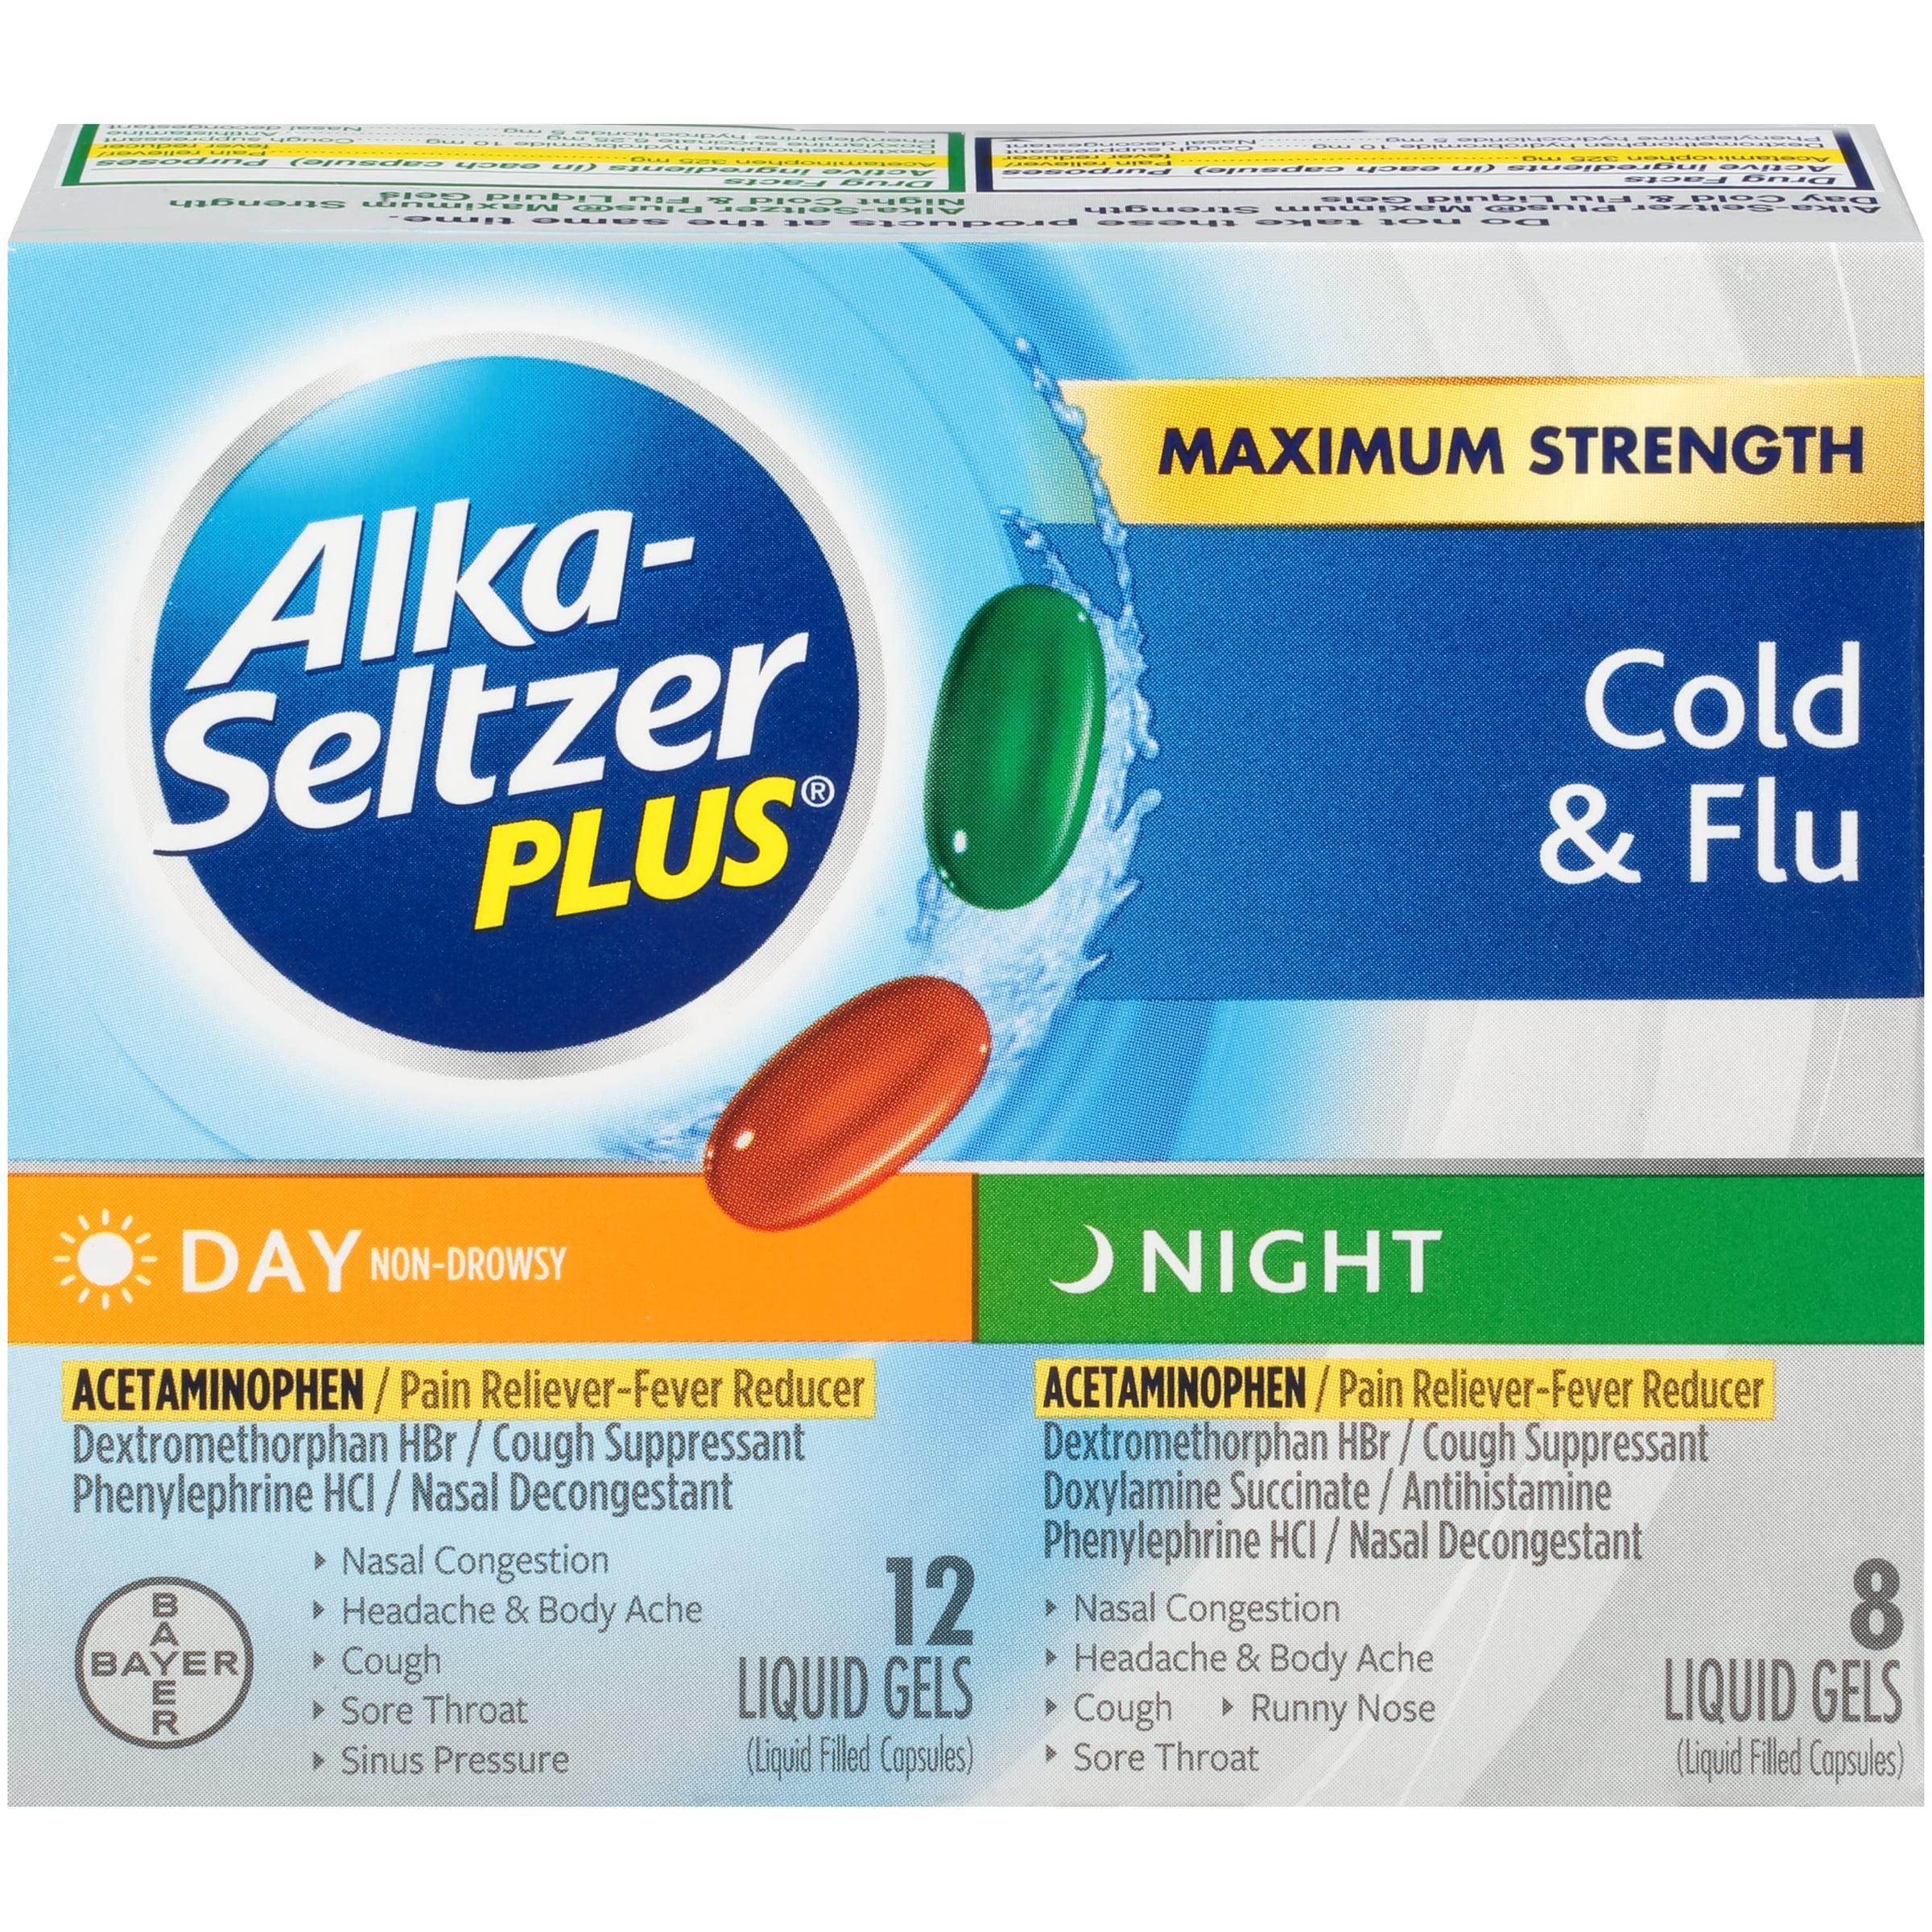 Alka-Seltzer Plus Day & Night Multi-Symptom Cold & Flu, Liquid Gels, 20 ct